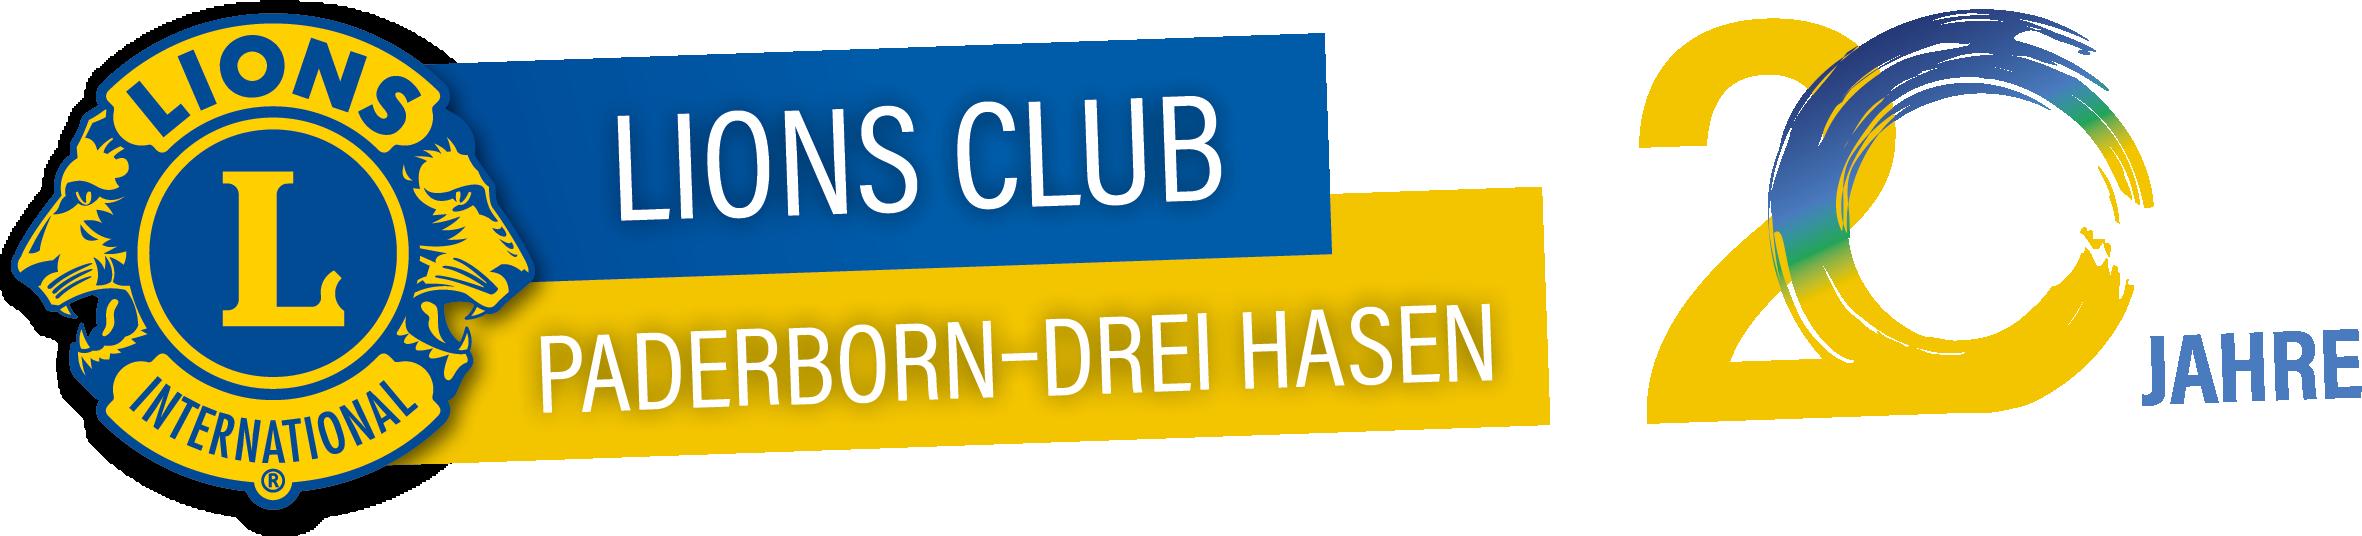 Lions Club Paderborn 3 Hasen